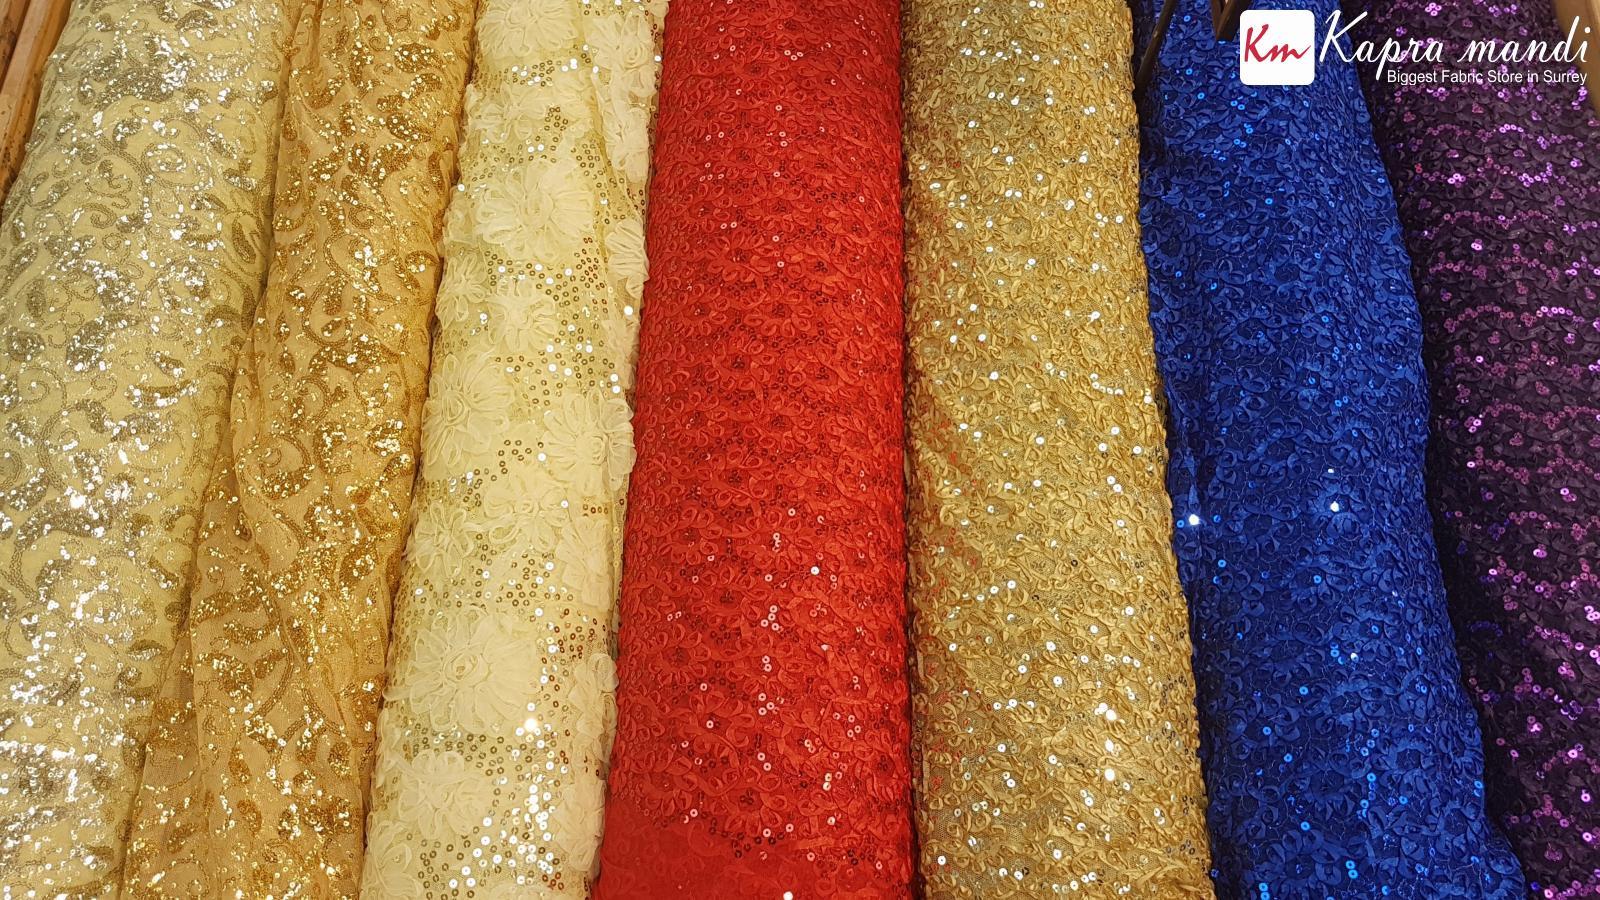 Decoration fabric sale at Kapra Mandi